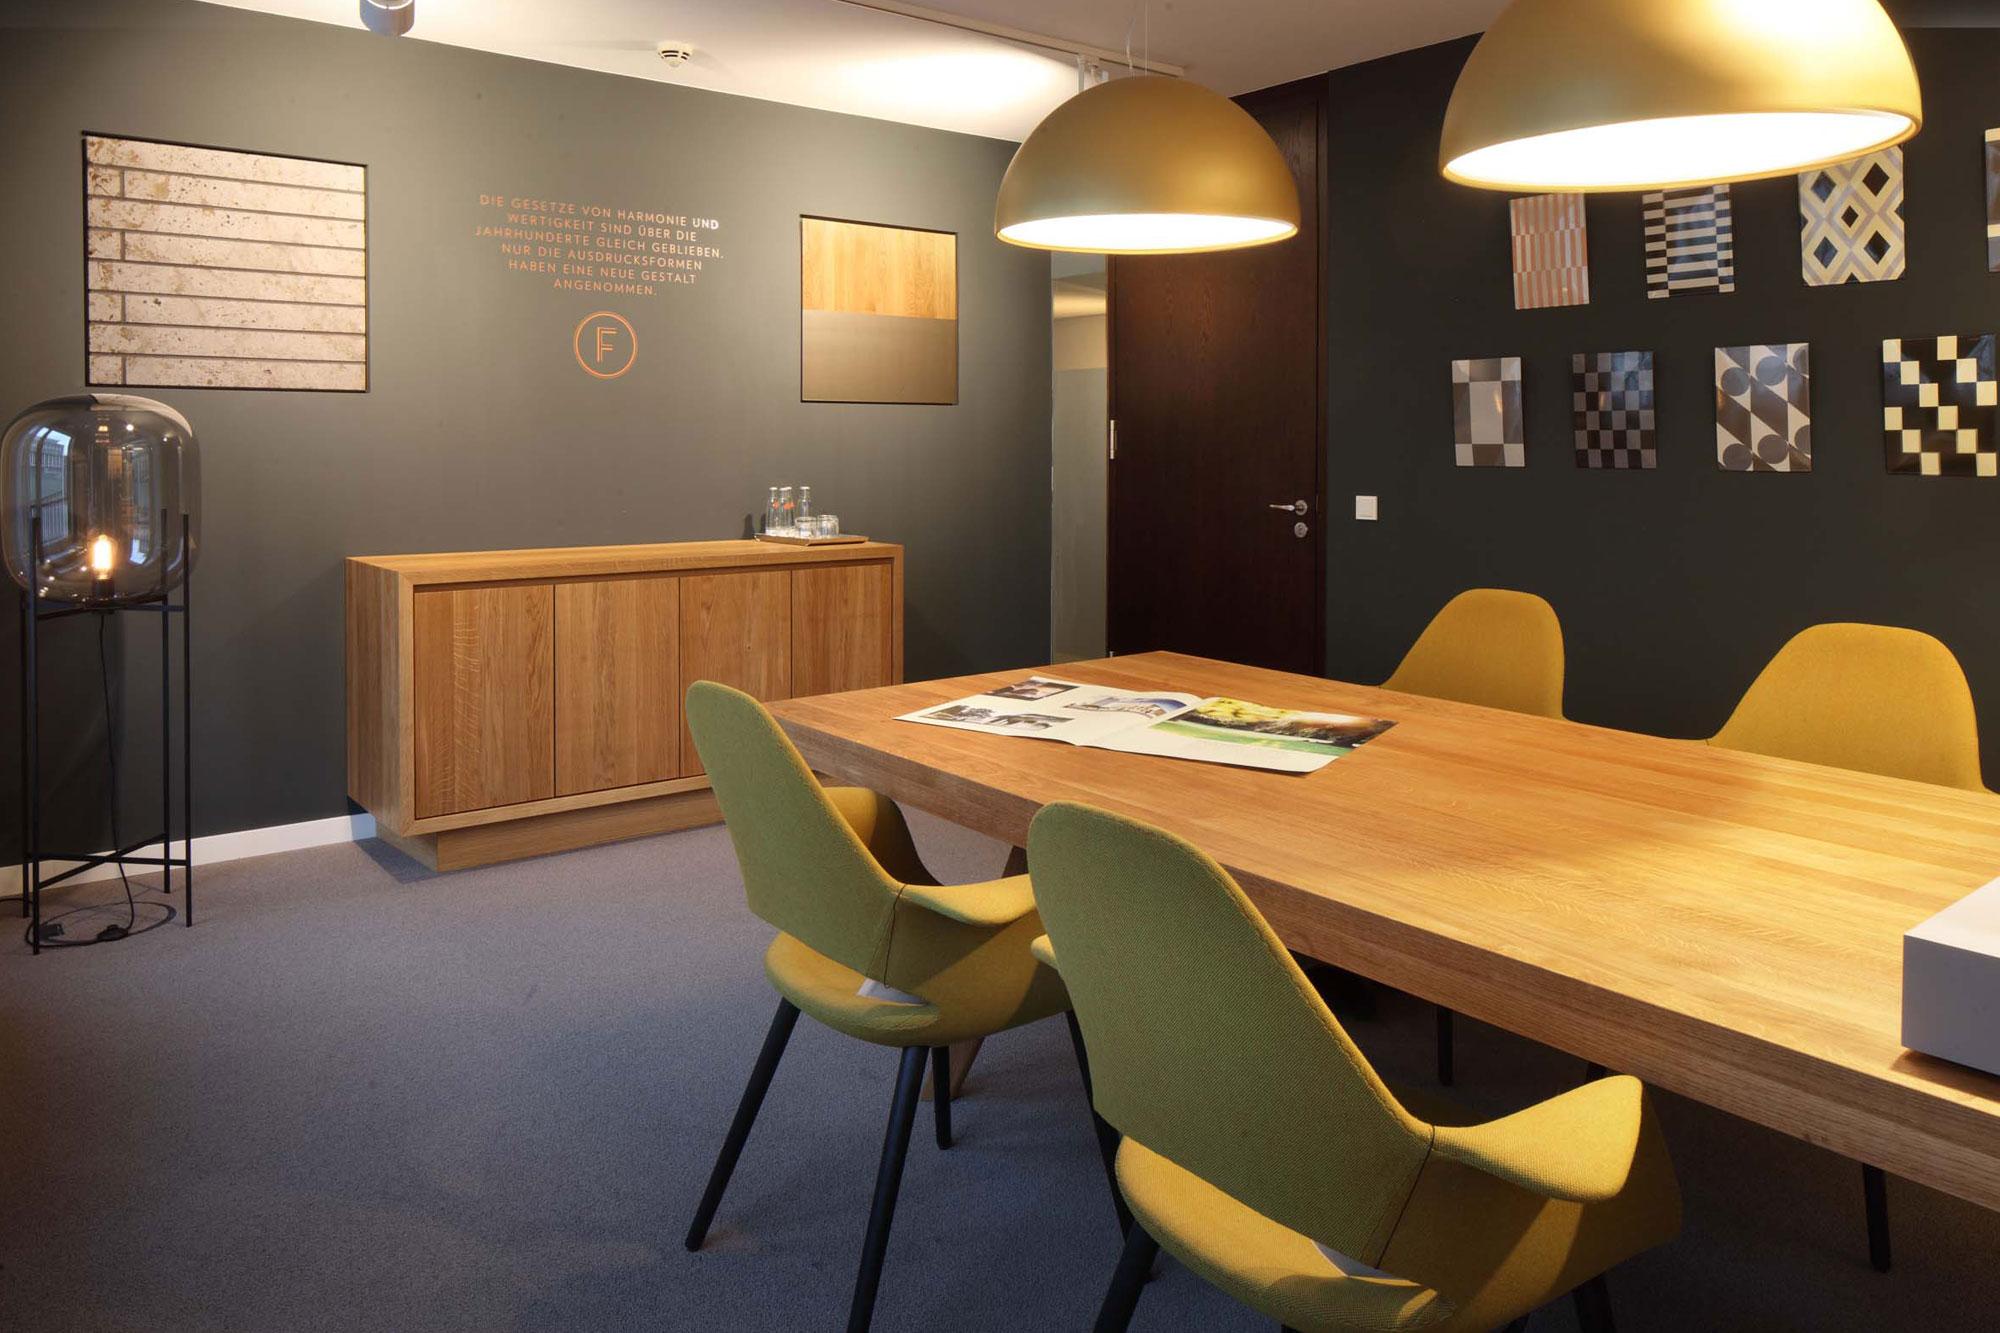 morgen-projects-konferenzraum-office-4